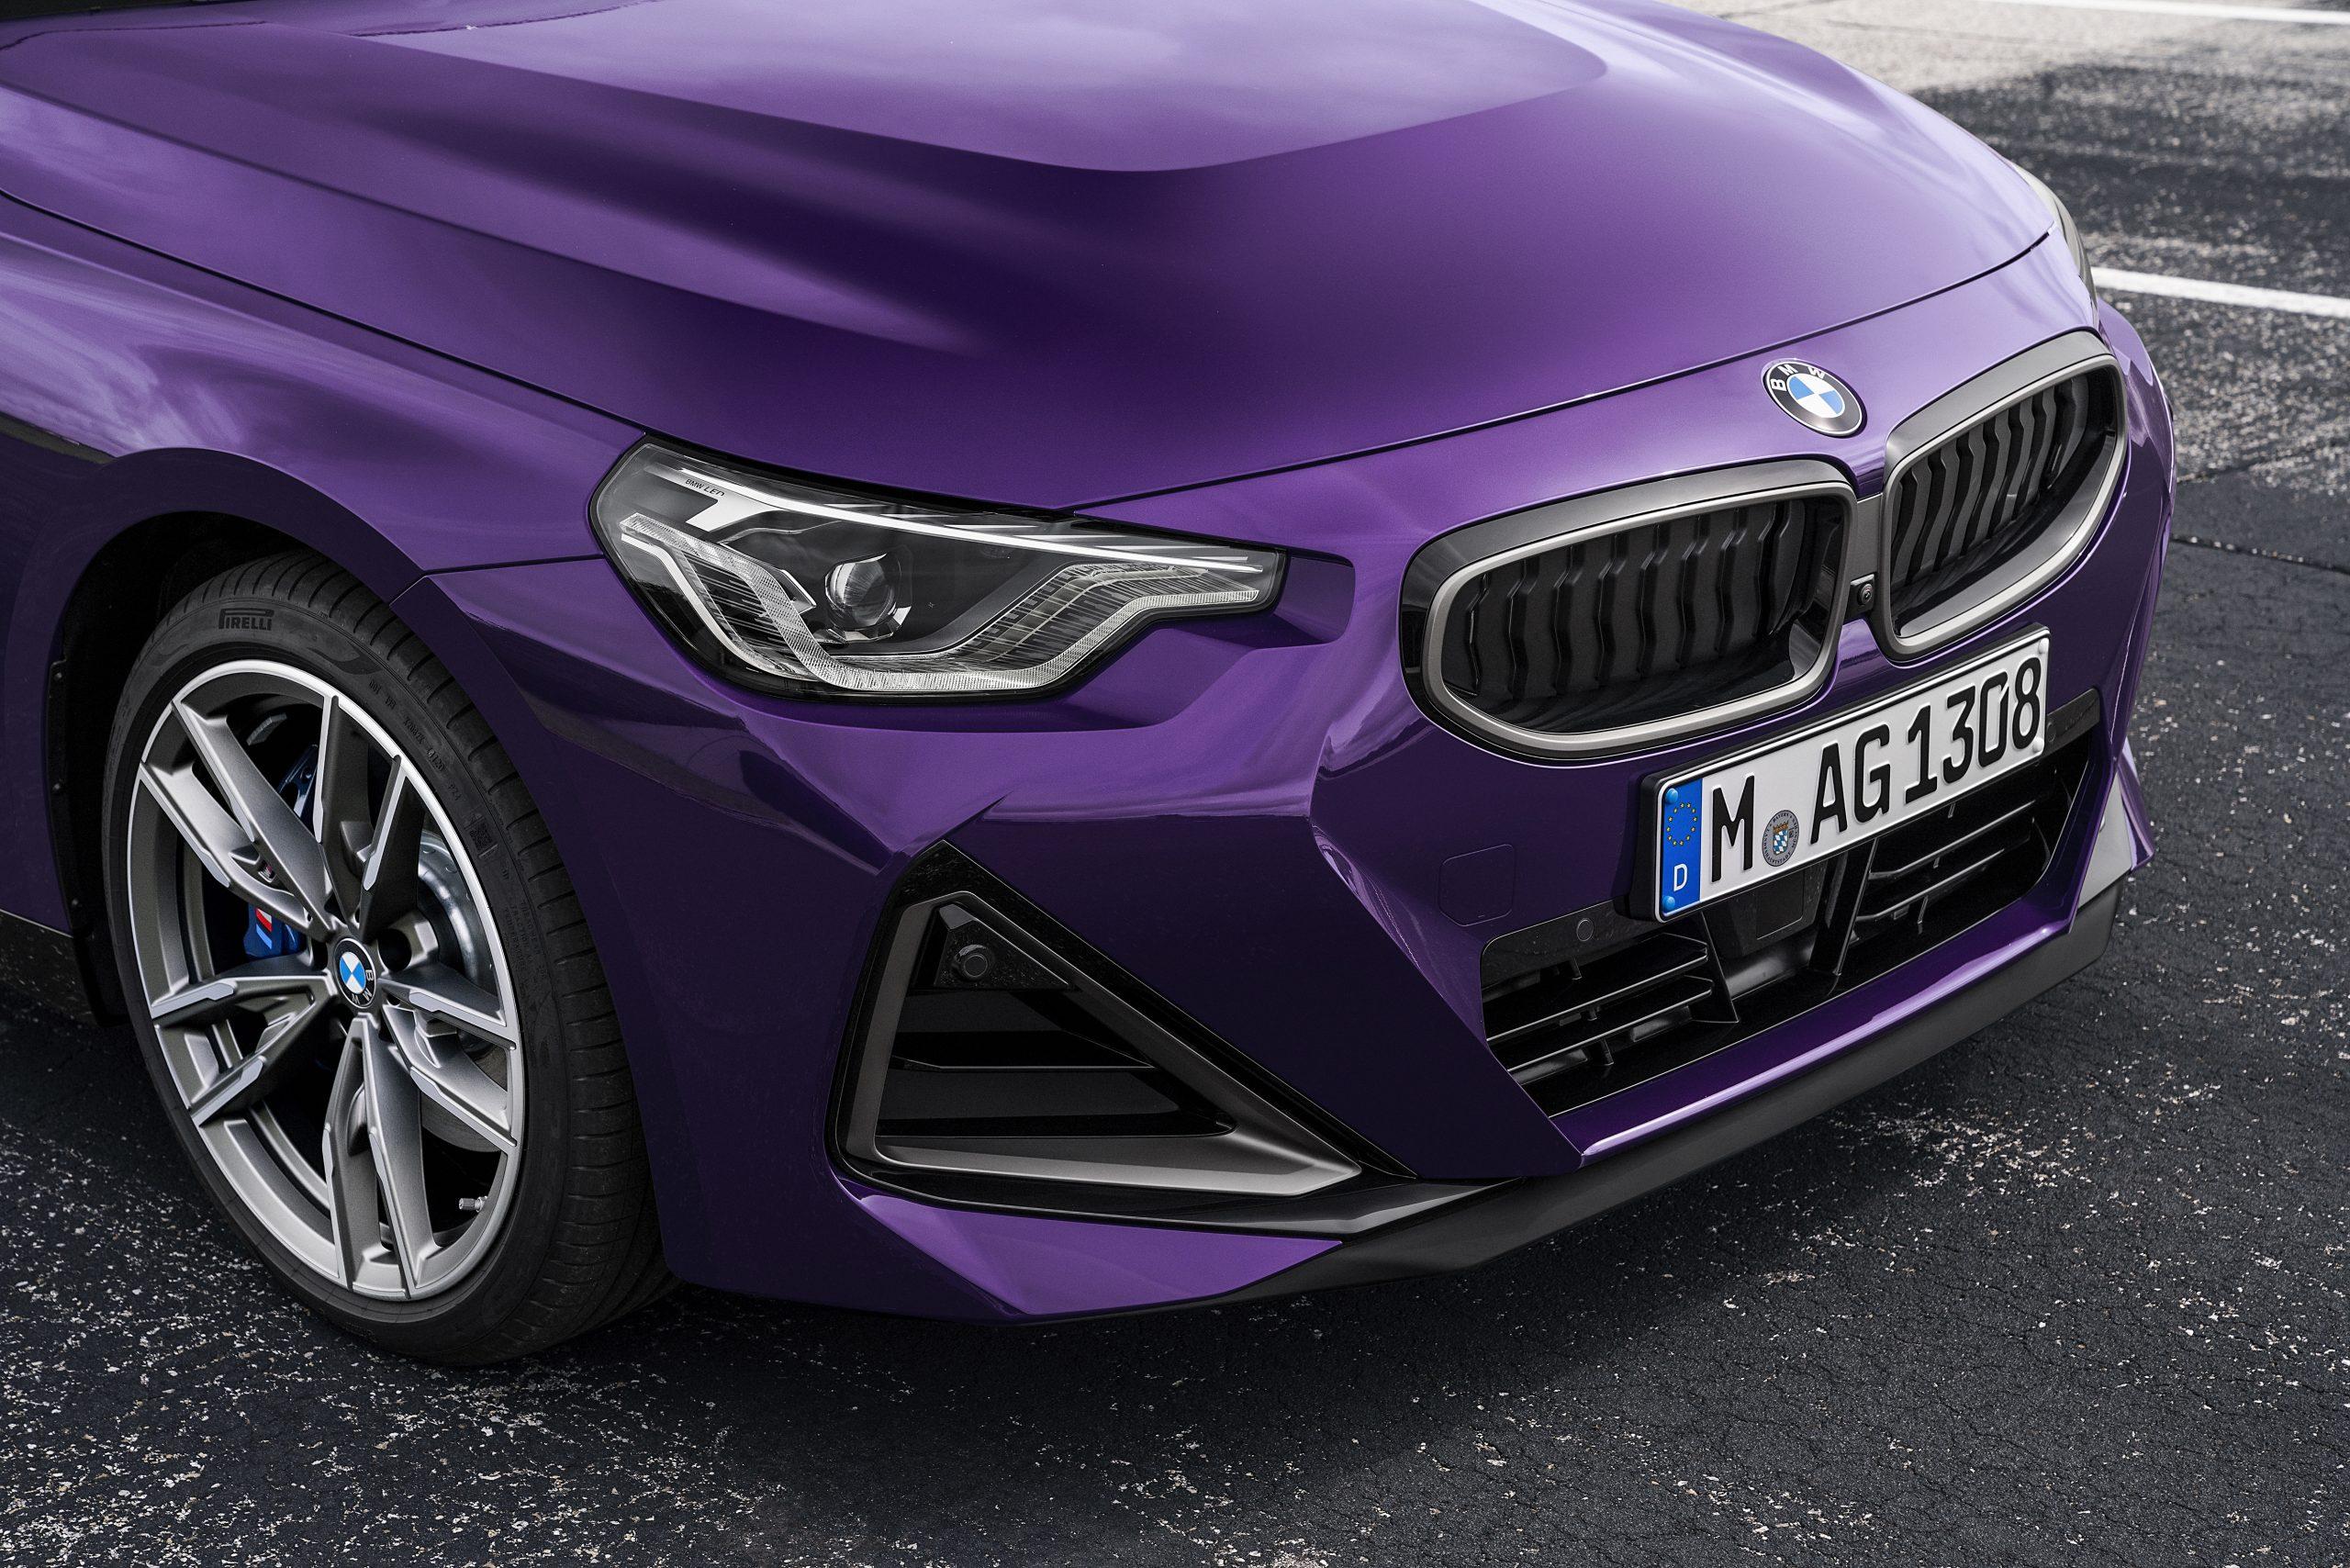 P90428459 highRes scaled Αυτή είναι η νέα BMW Σειρά 2 Coupe BMW, Bmw 2, BMW Σειρά 2, zblog, ειδήσεις, Νέα, Σειρά 2